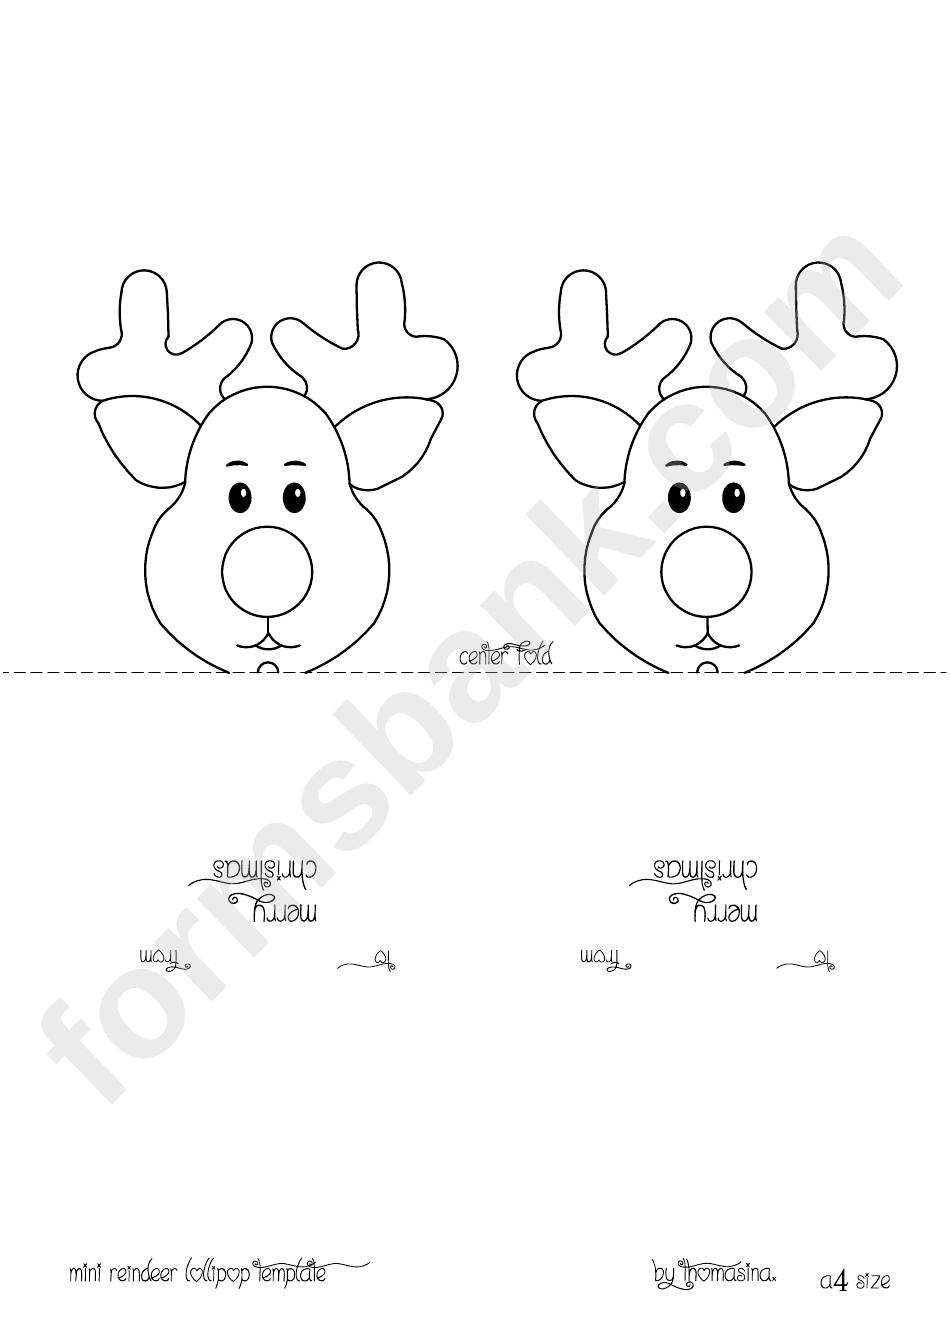 Mini Reindeer Lollipop Template | Holidays!! | Reindeer, Reindeer - Free Printable Reindeer Lollipop Template